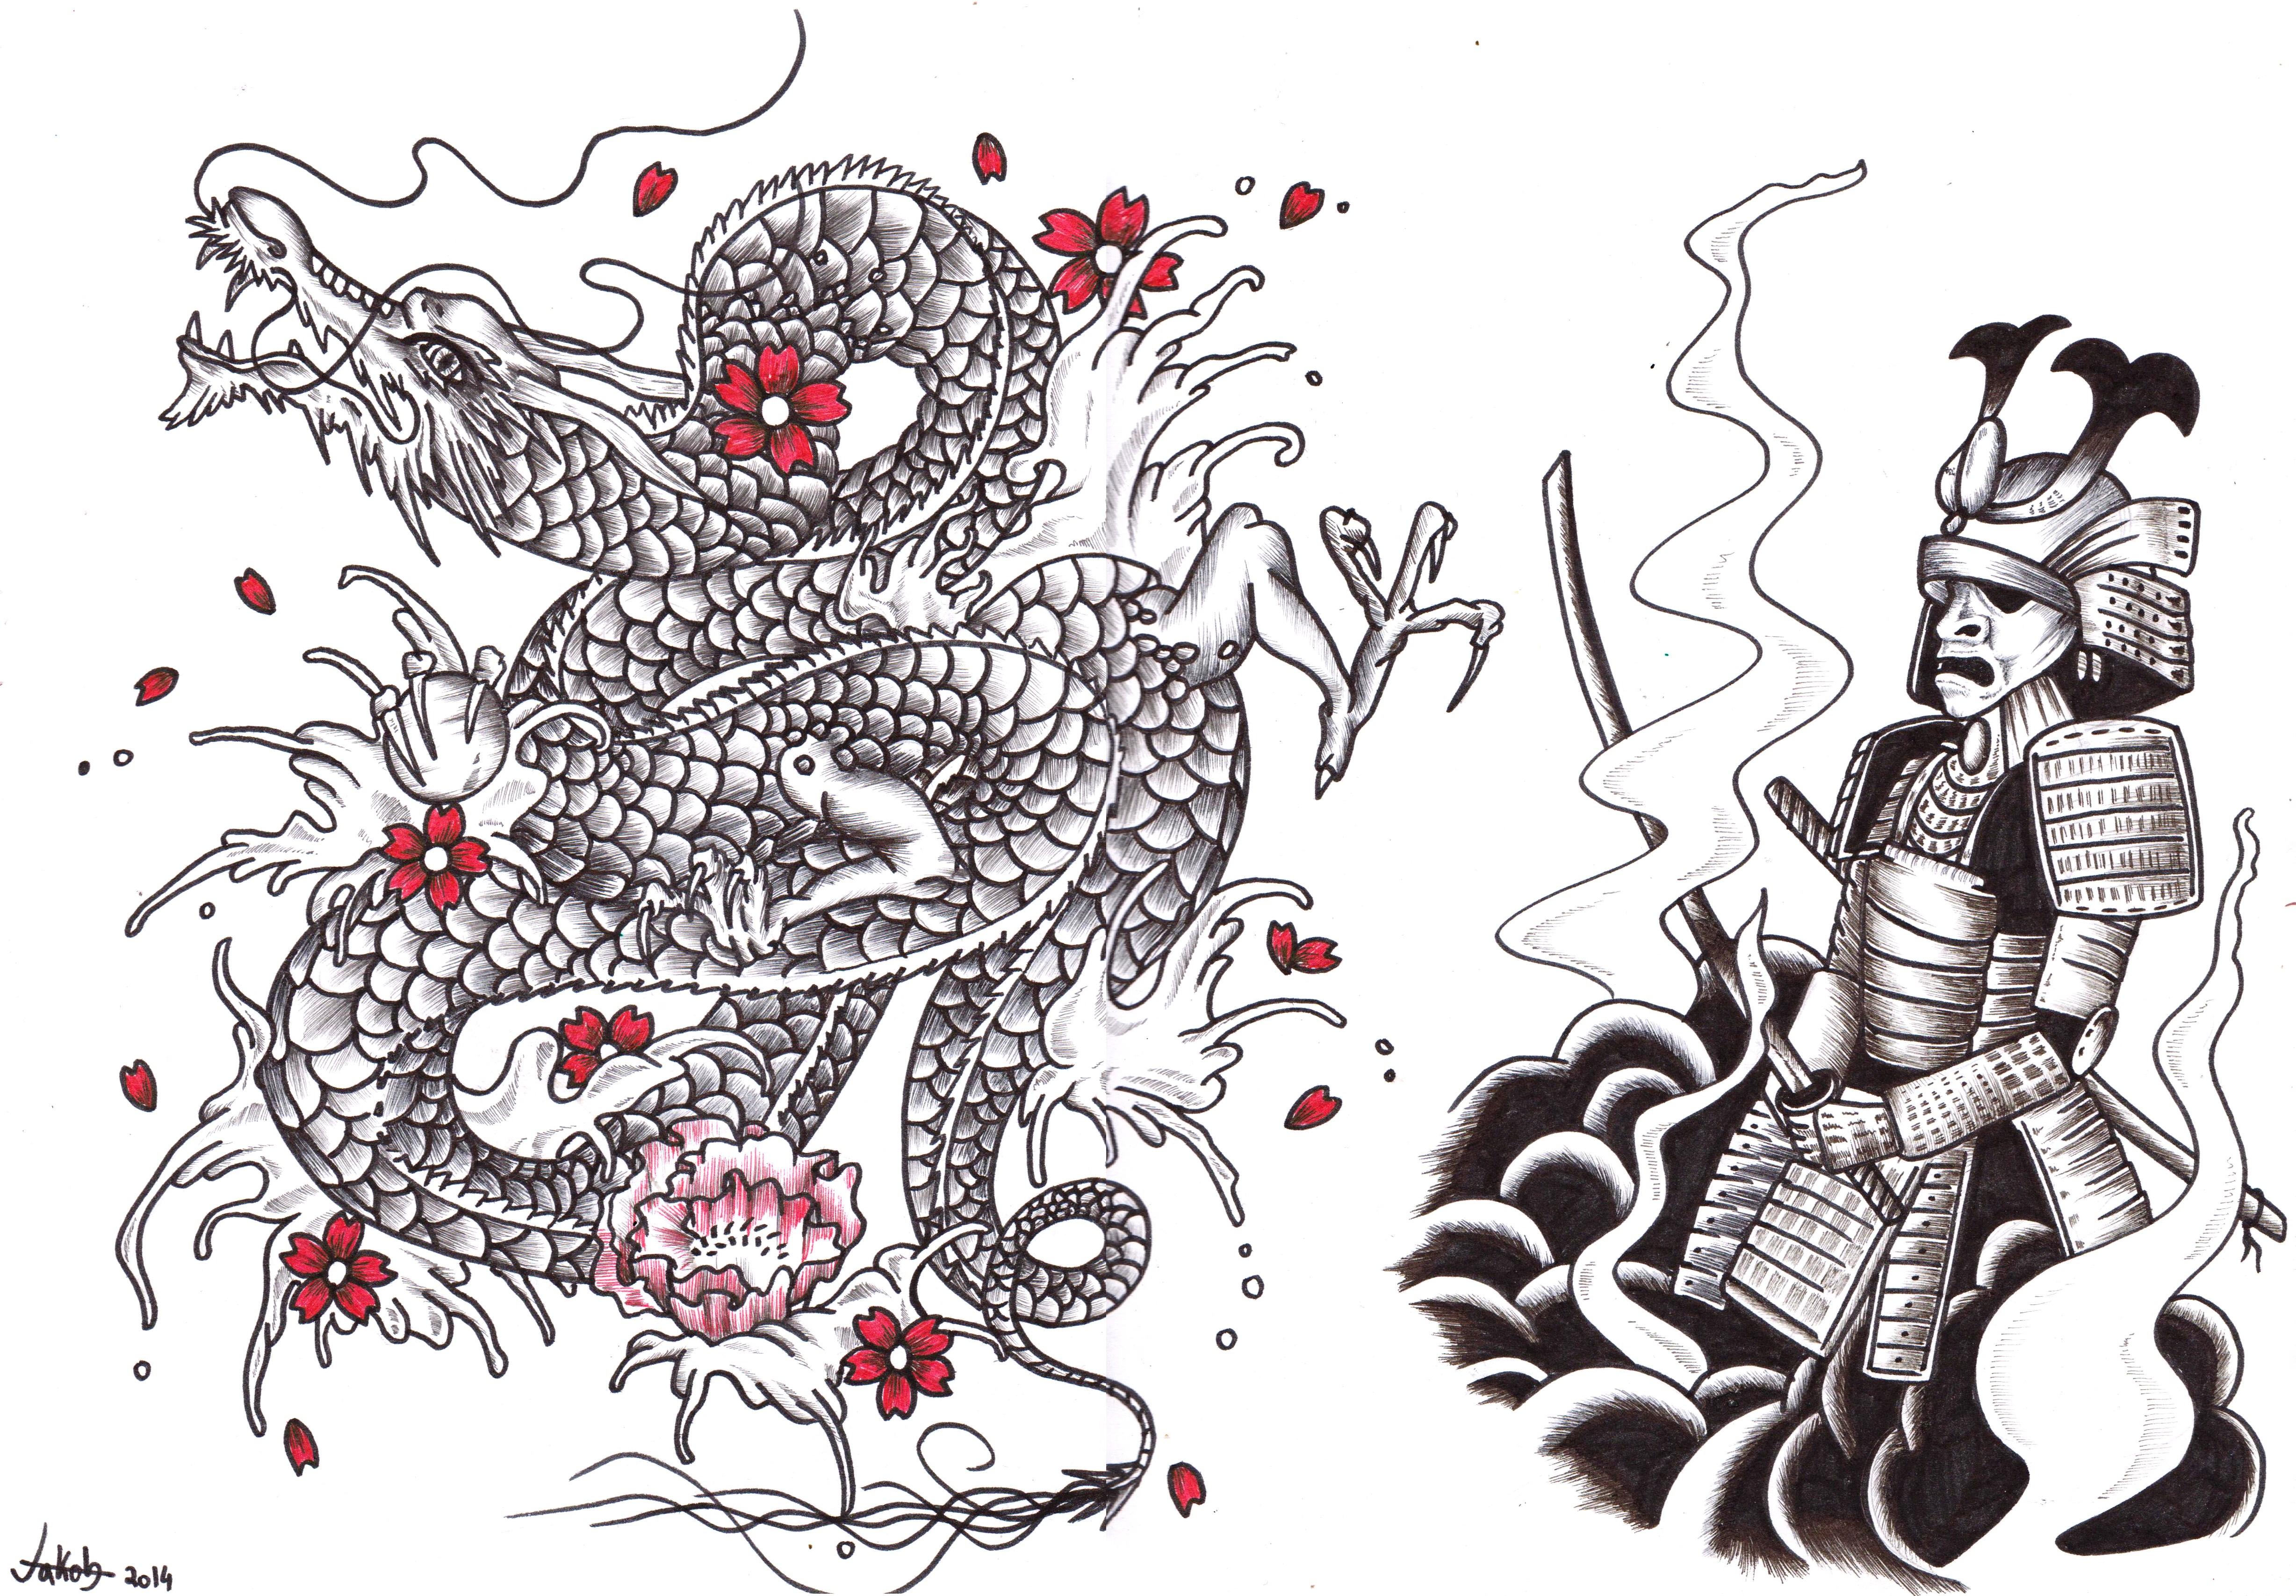 3d Lotus Live Wallpaper Illustration Jakobbelbin S Art